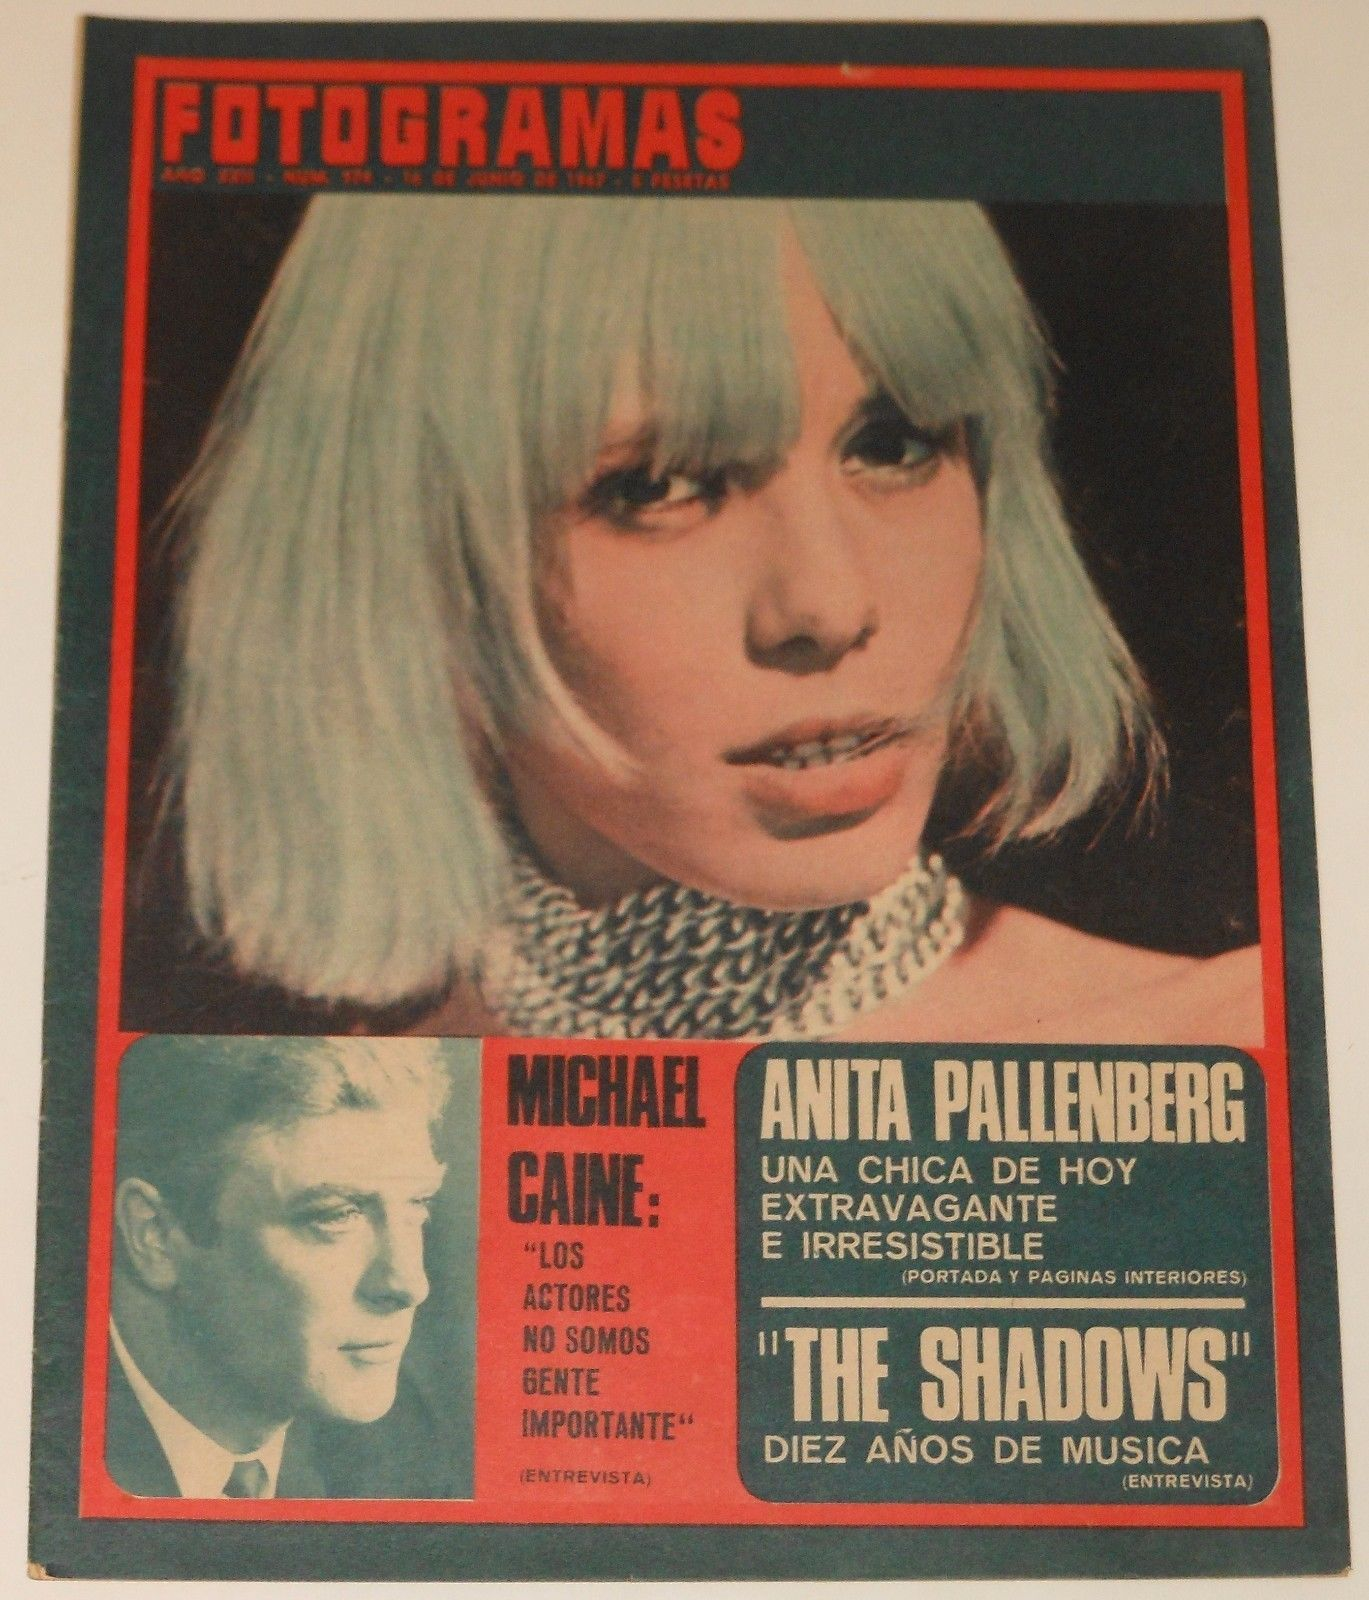 Anita Pallenberg - Fotogramas (Spain) #974; 1967 (1)